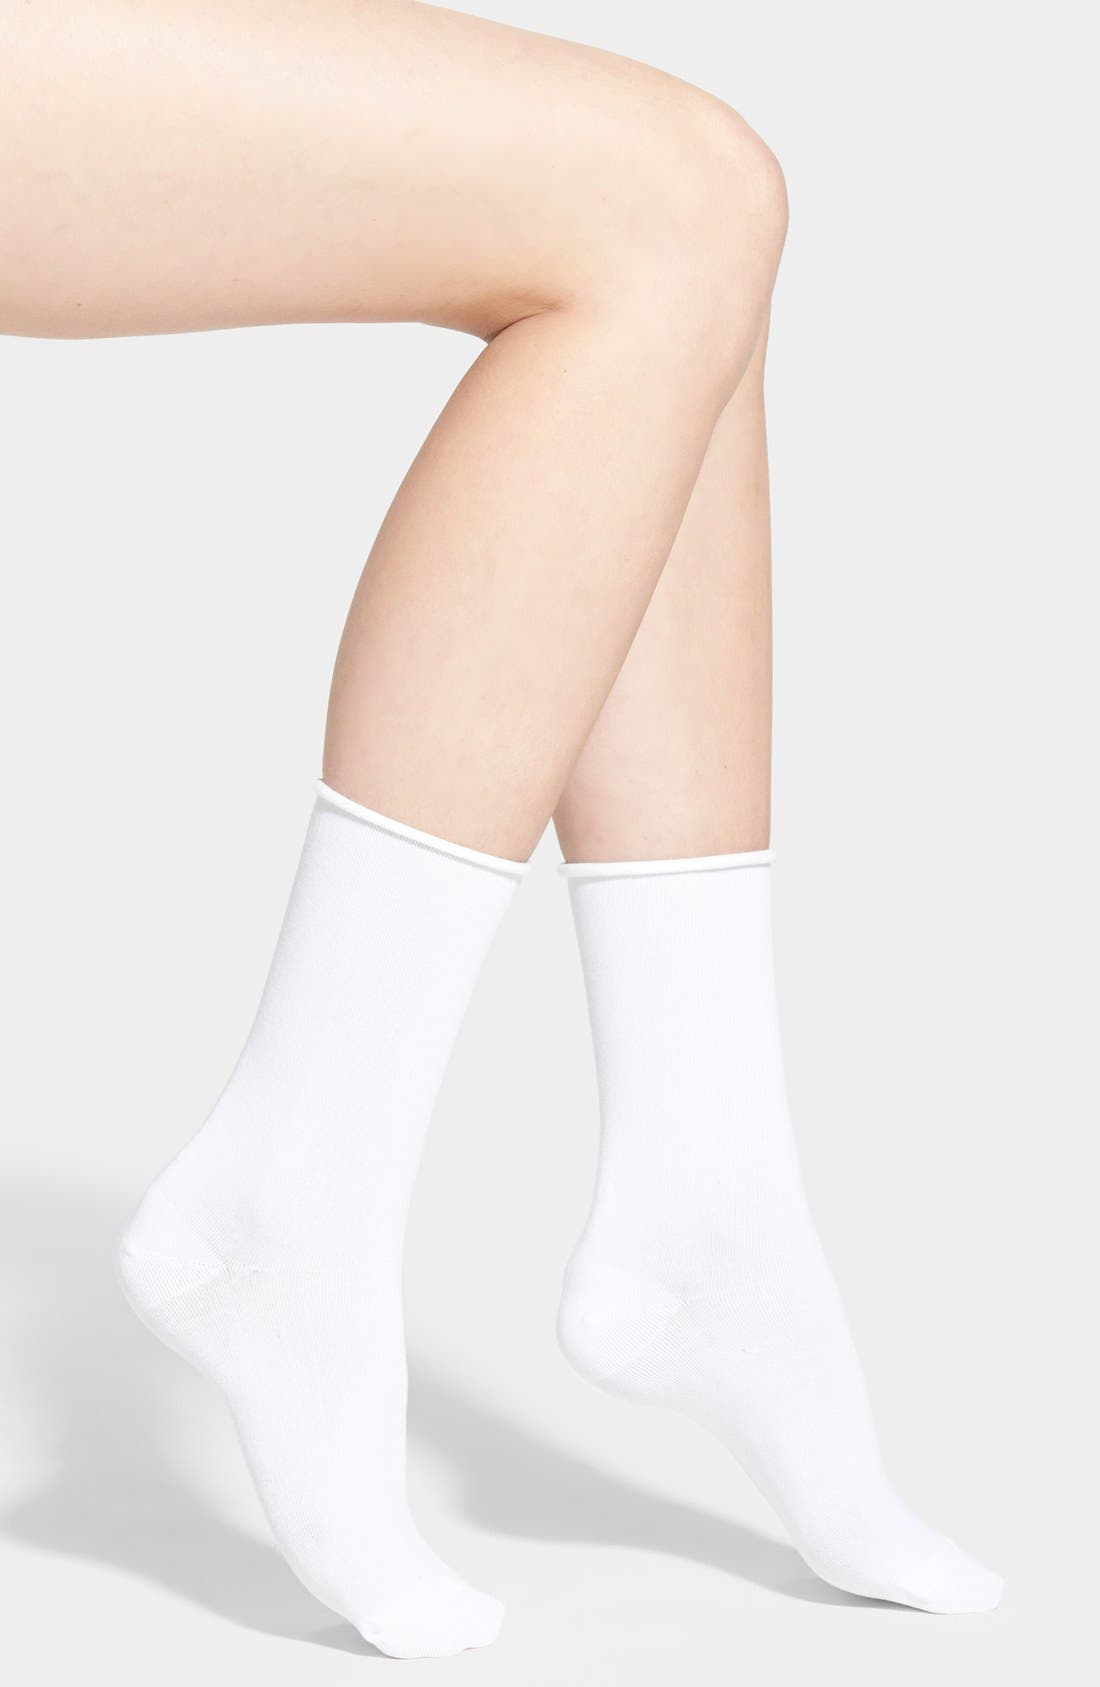 Main Image - Hue 'Jeans' Socks (3 for $18)